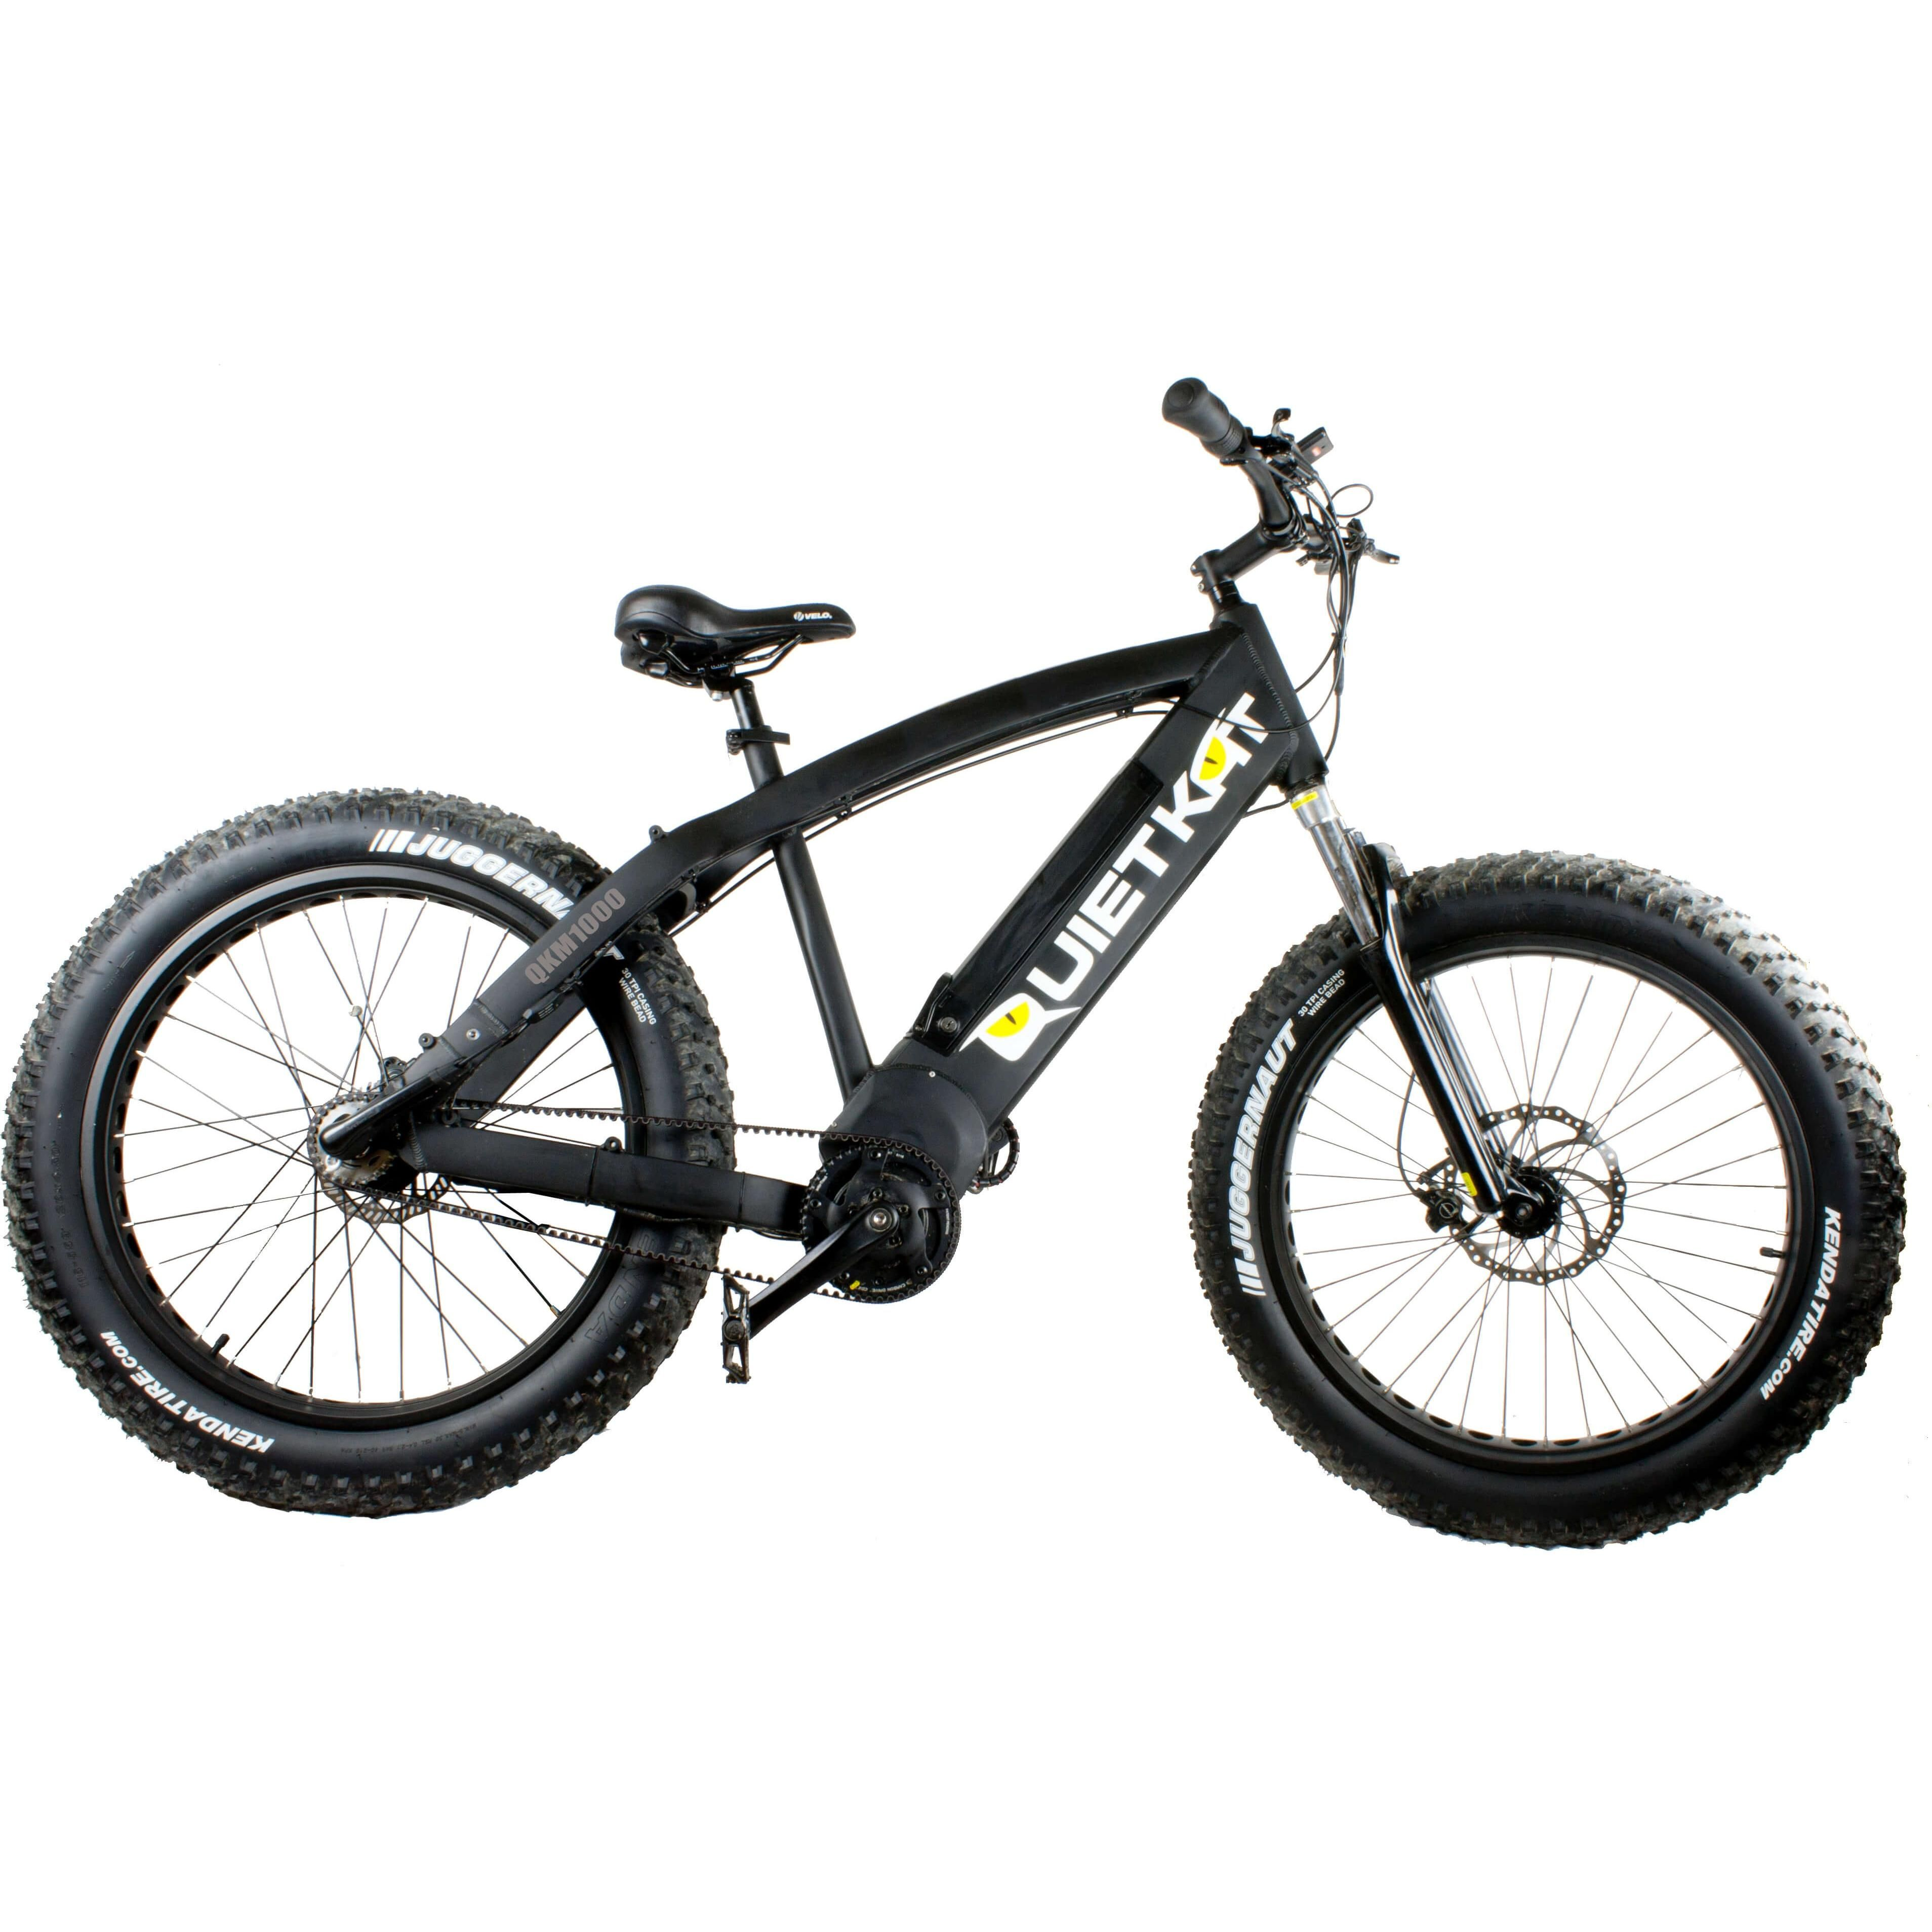 Quietkat Fatkat 48v 1000w Internal Motor Carbon Belt Drive Electric Mountain Bike Black City Bike Bike Electric Mountain Bike